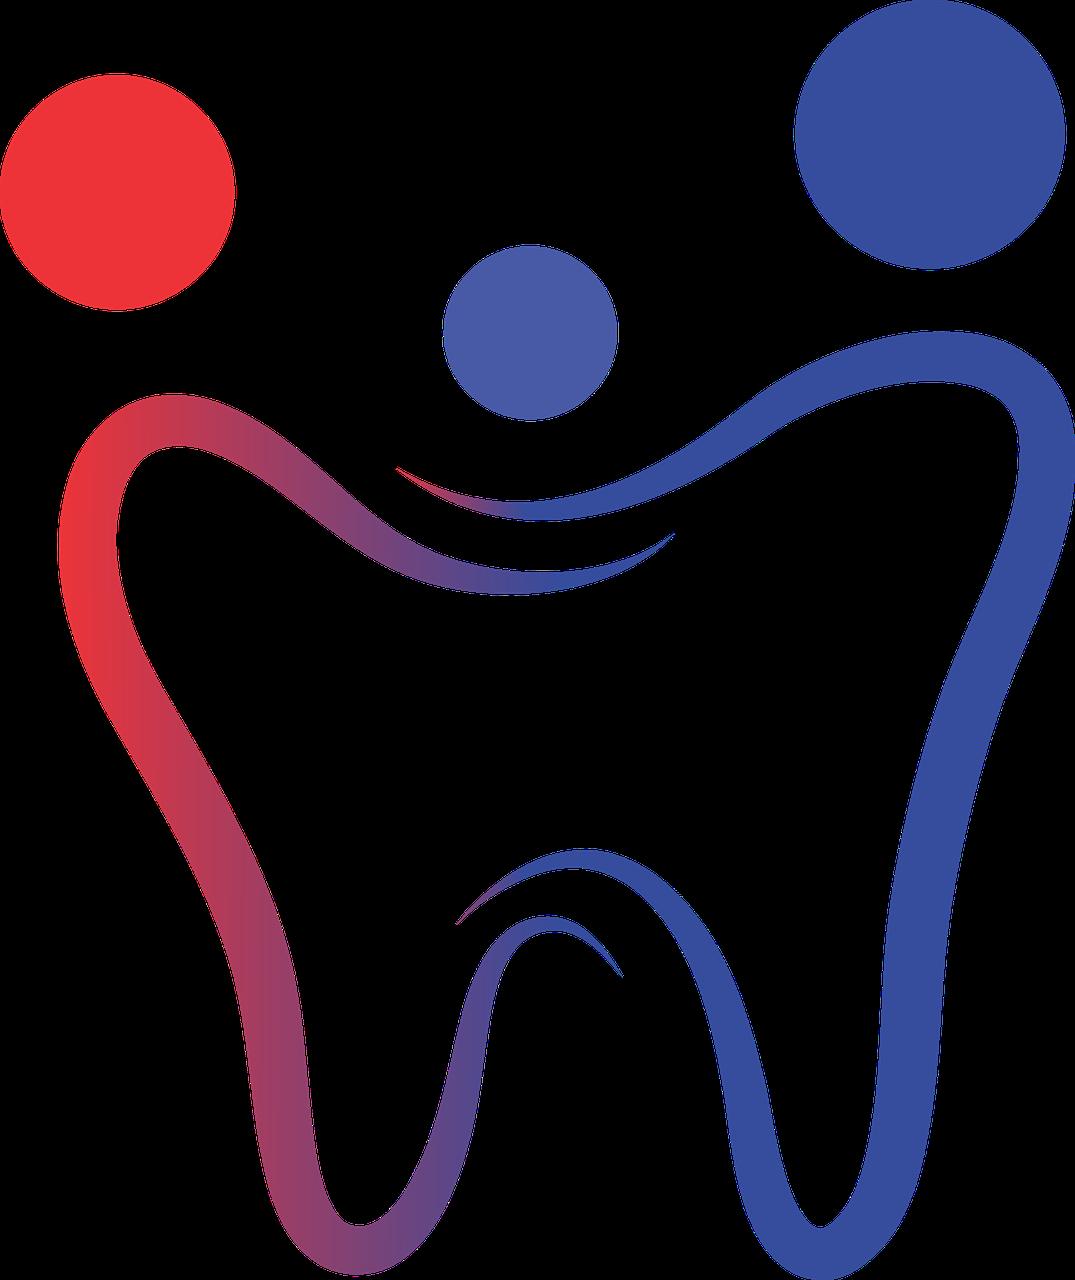 Tandheelkunde Kennemerlaan Praktijk voor spoedeisende tandarts